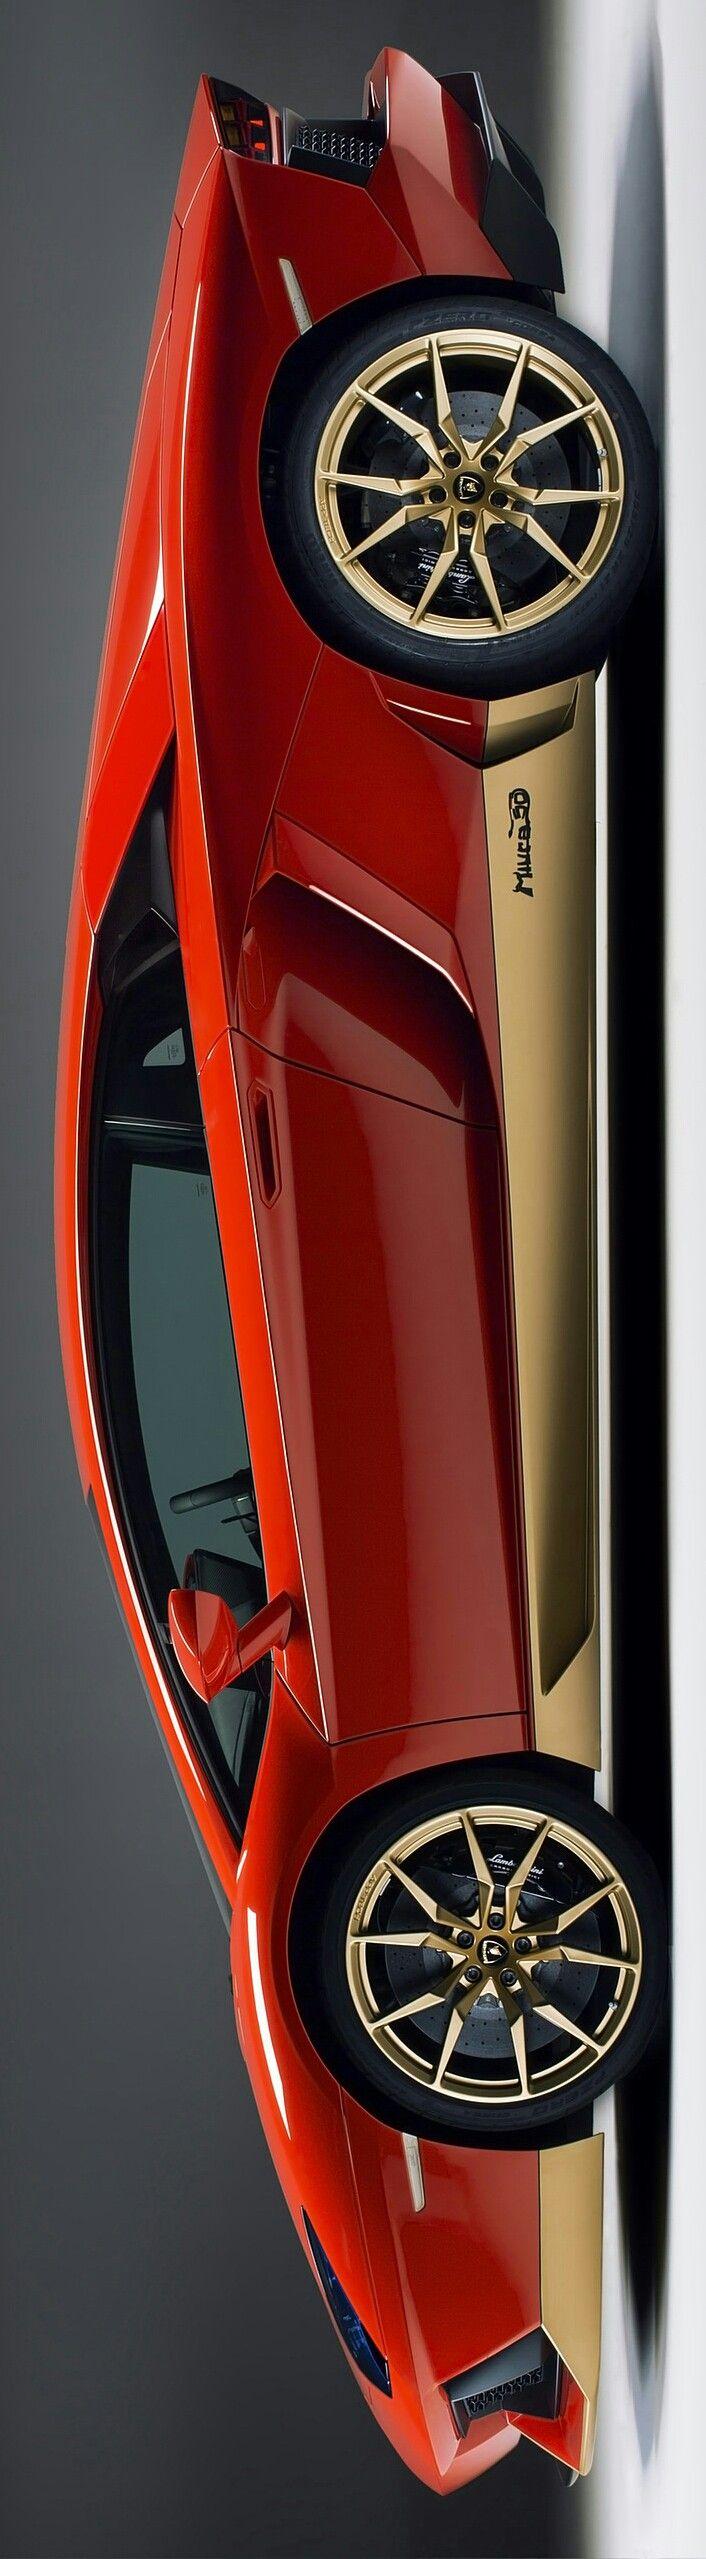 2016 Lamborghini Aventador Miura Homage Special Edition by Levon